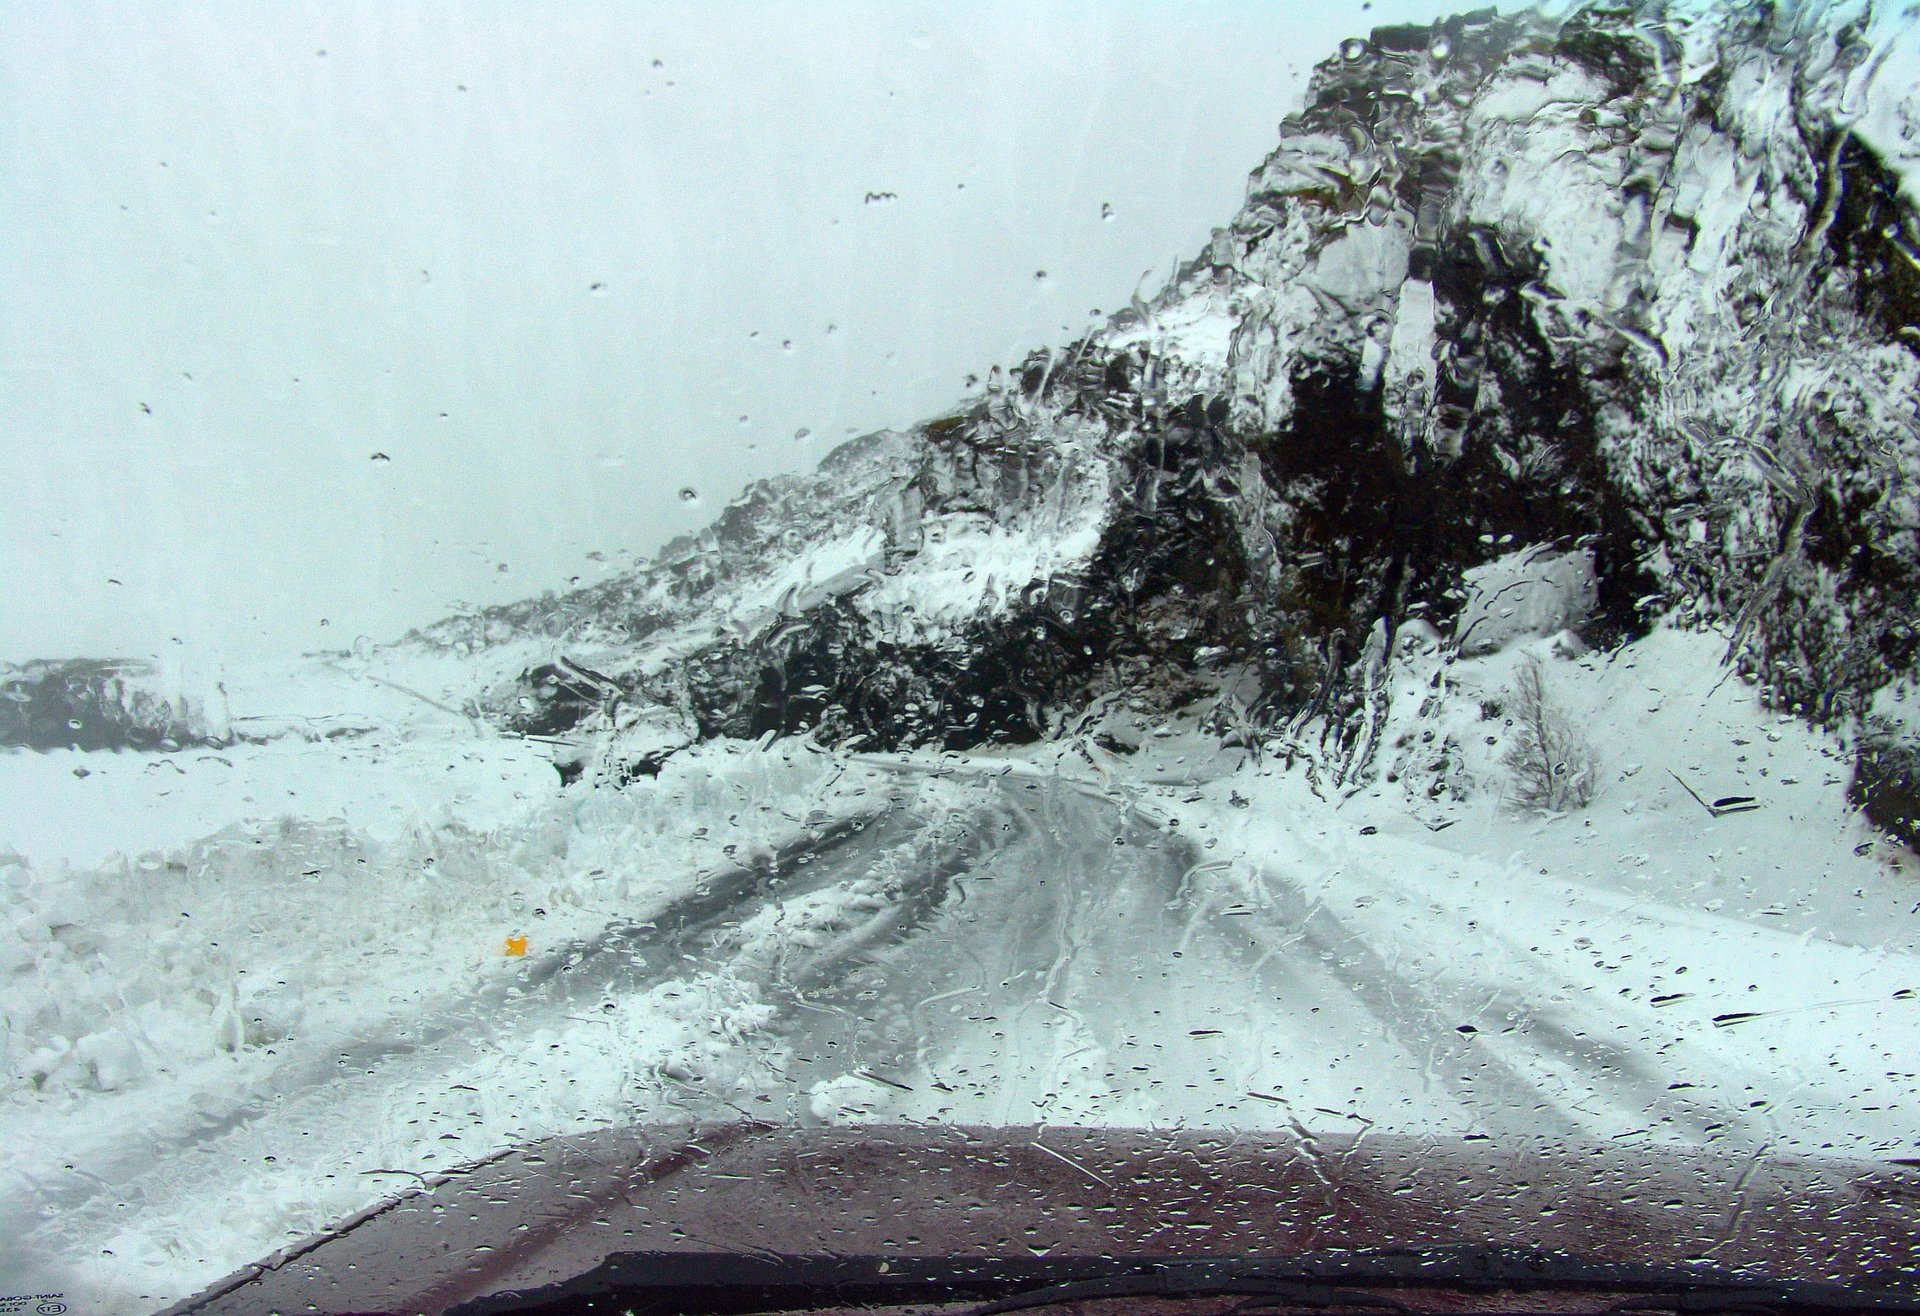 , Copyright © Ruslendingur,  Kleifarvatn, R42, winter, weather;